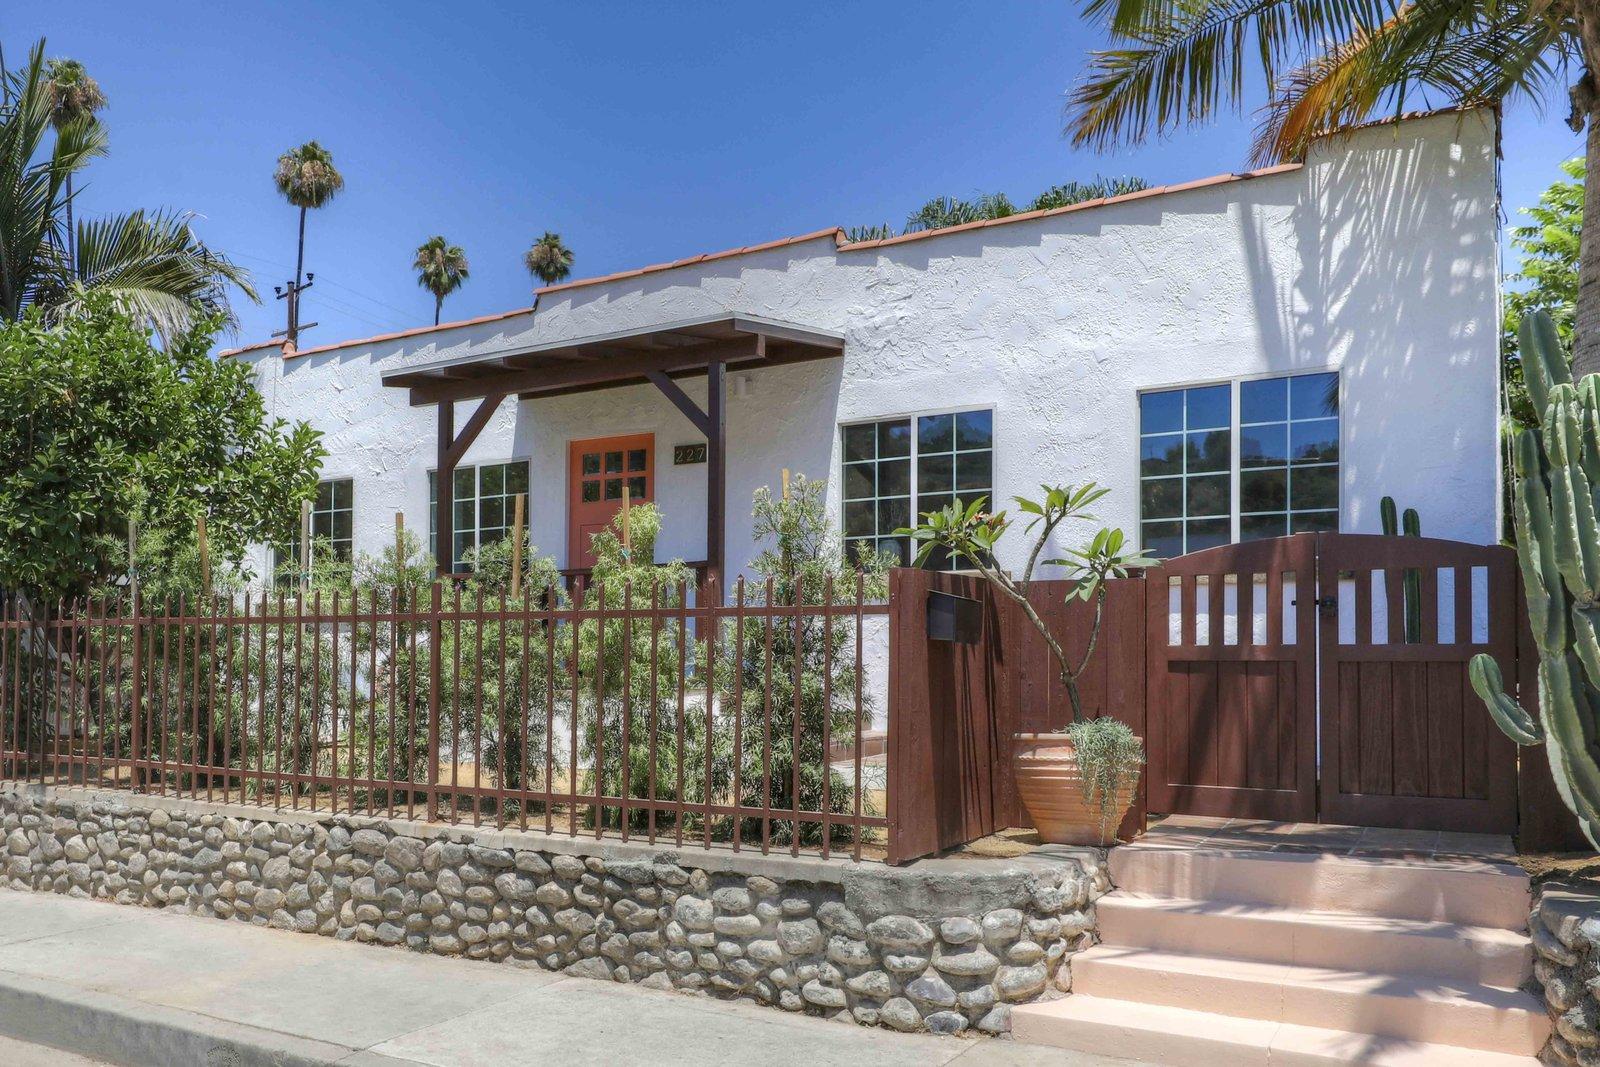 Los Angeles Spanish Bungalow Exterior